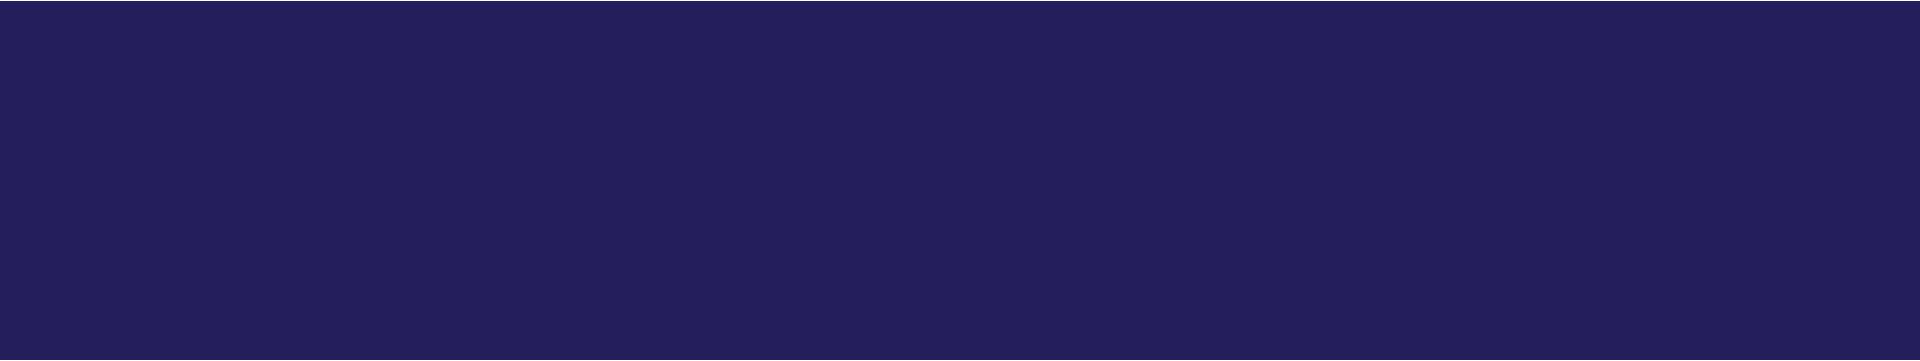 StarMAX-Div-Azul01.png